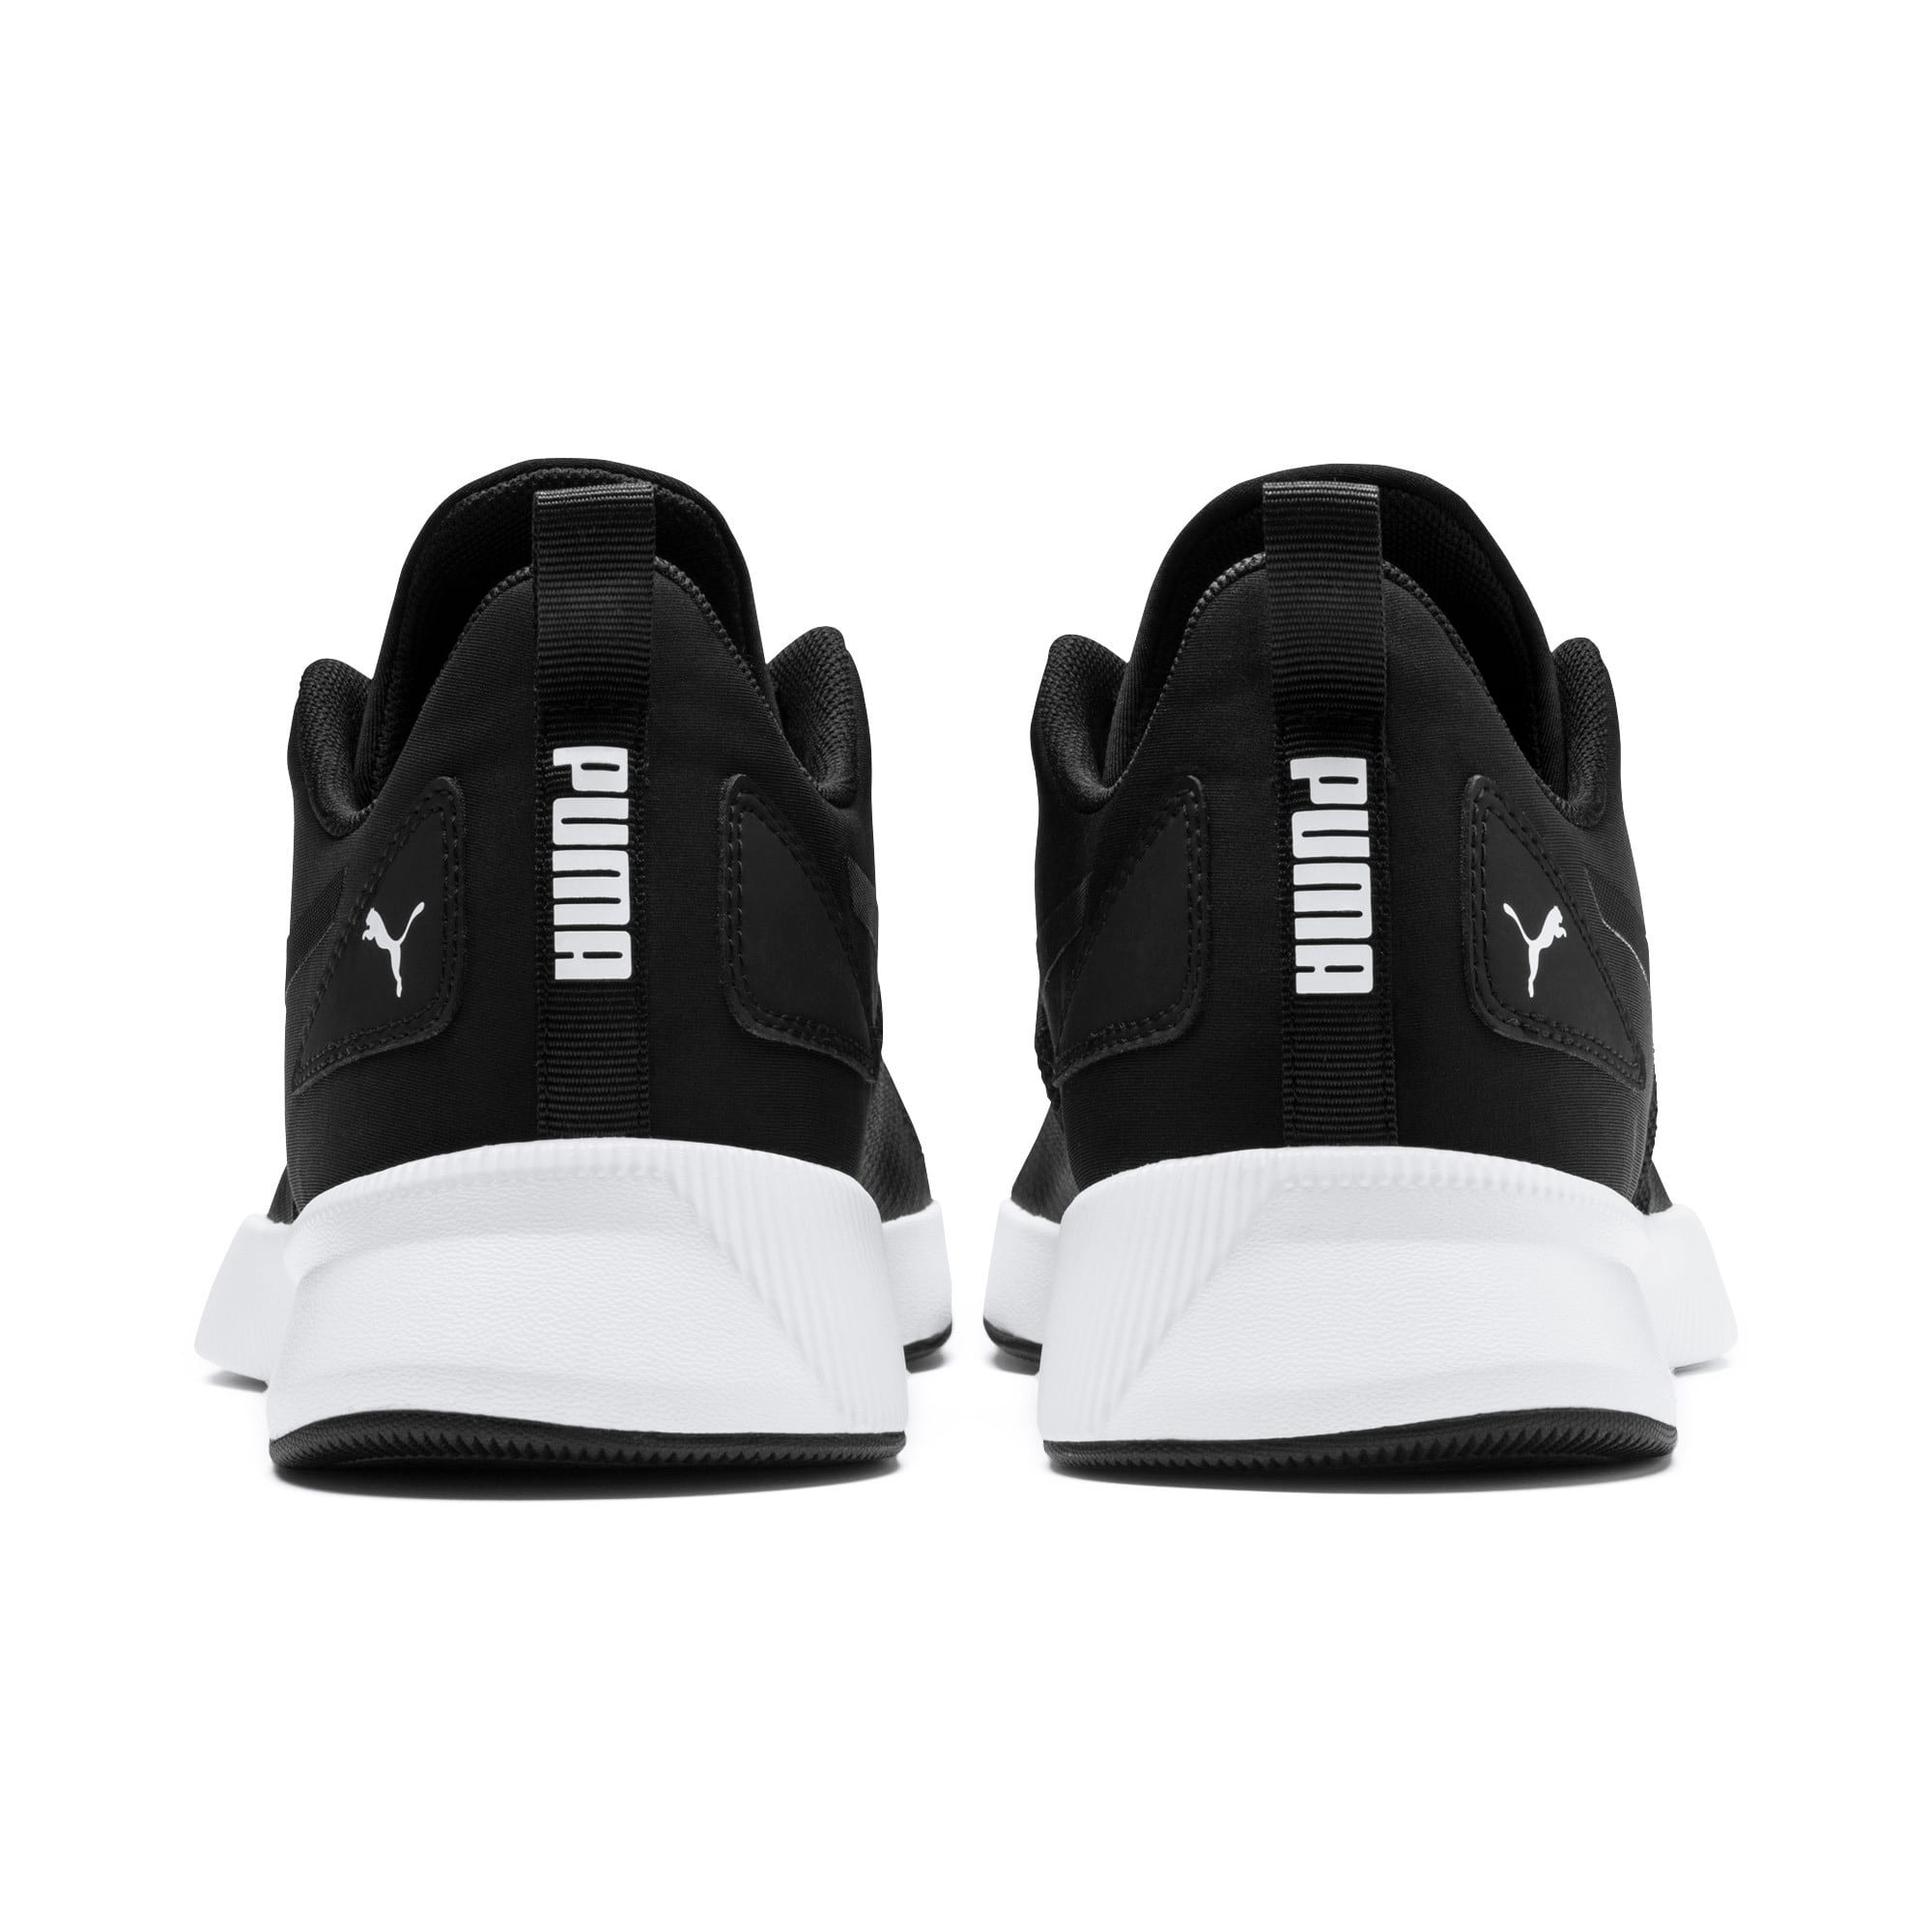 Thumbnail 3 of Flyer Running Shoes, Black-Black-White, medium-IND